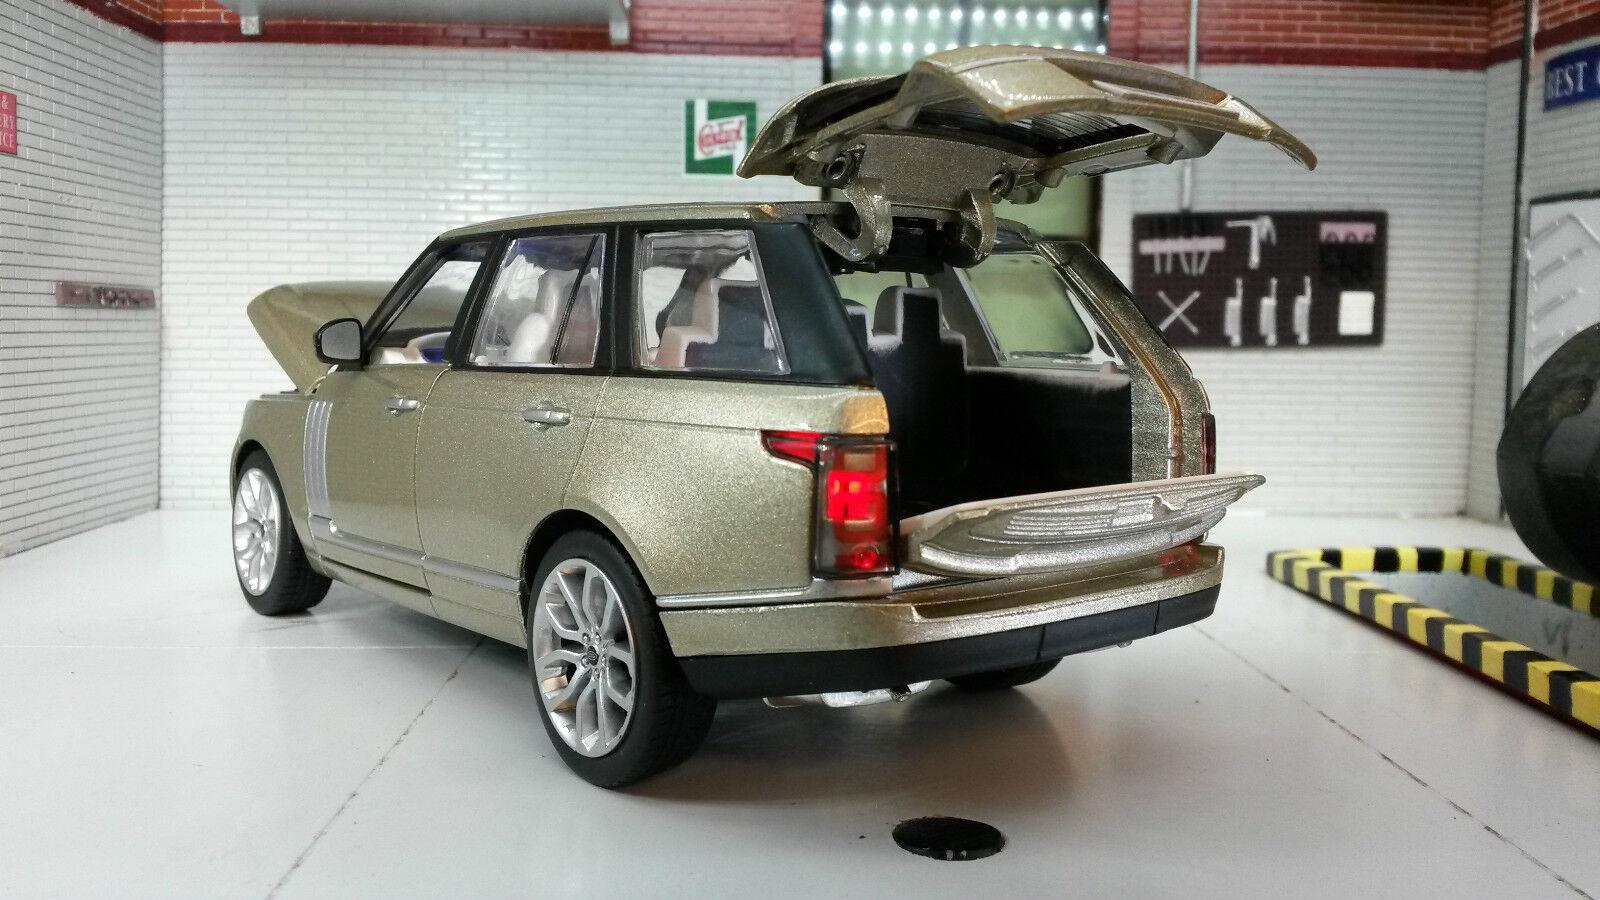 1 24 26 Range Rover Rover Rover L405 Td6 4.4 V8 HSE Champagner Gold MSZ Druckguss Modell b80652